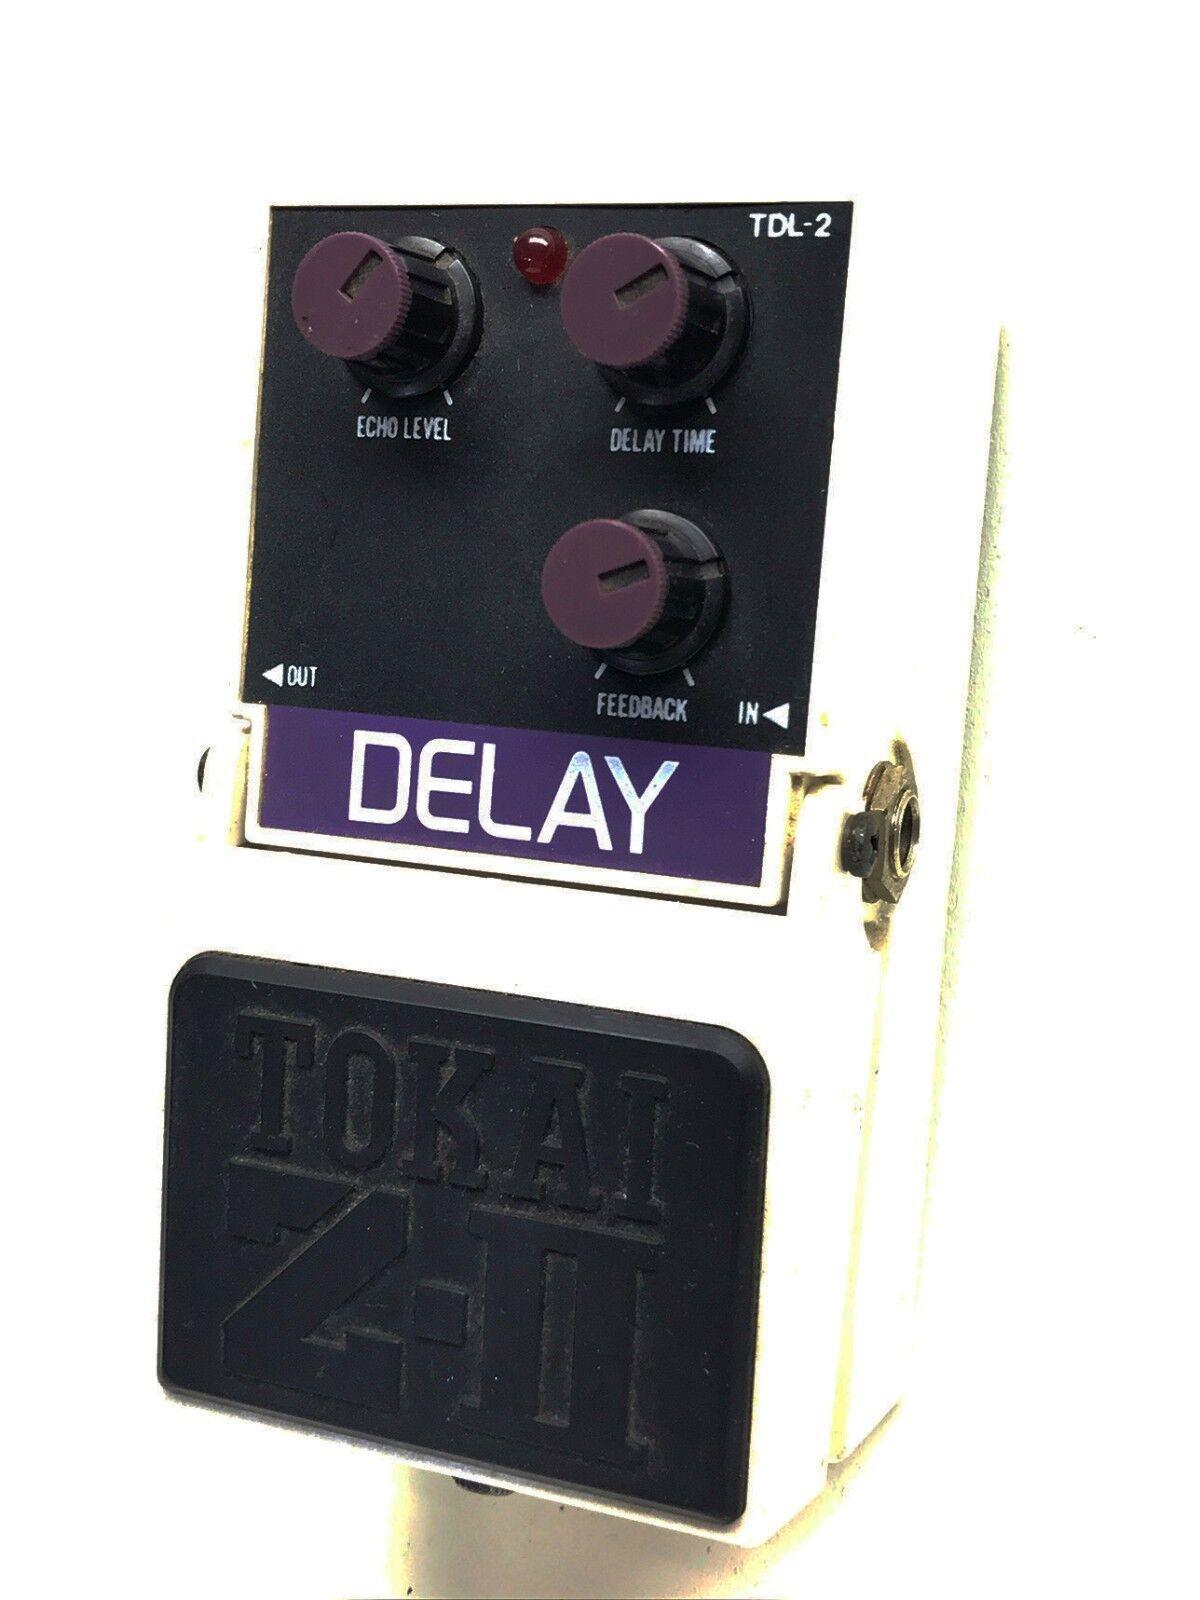 Tokai TDL-2, Analog Delay, Z-II Super Effects series, MIJ, 80's, Vintage